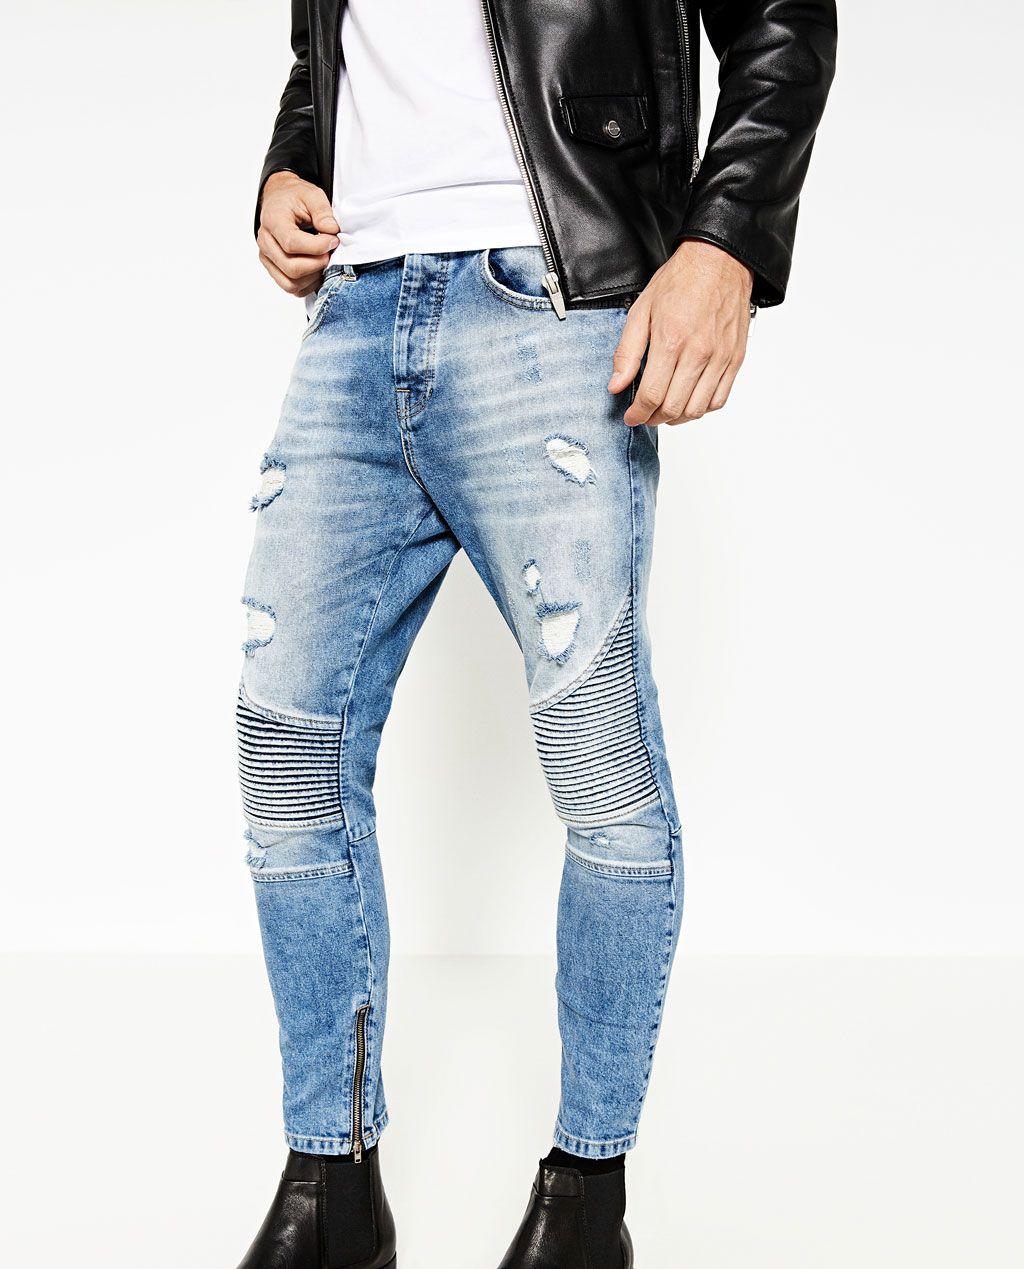 Image Jeans Zara Jeans Skinny 2 Of From Biker 0wnaq0rfR